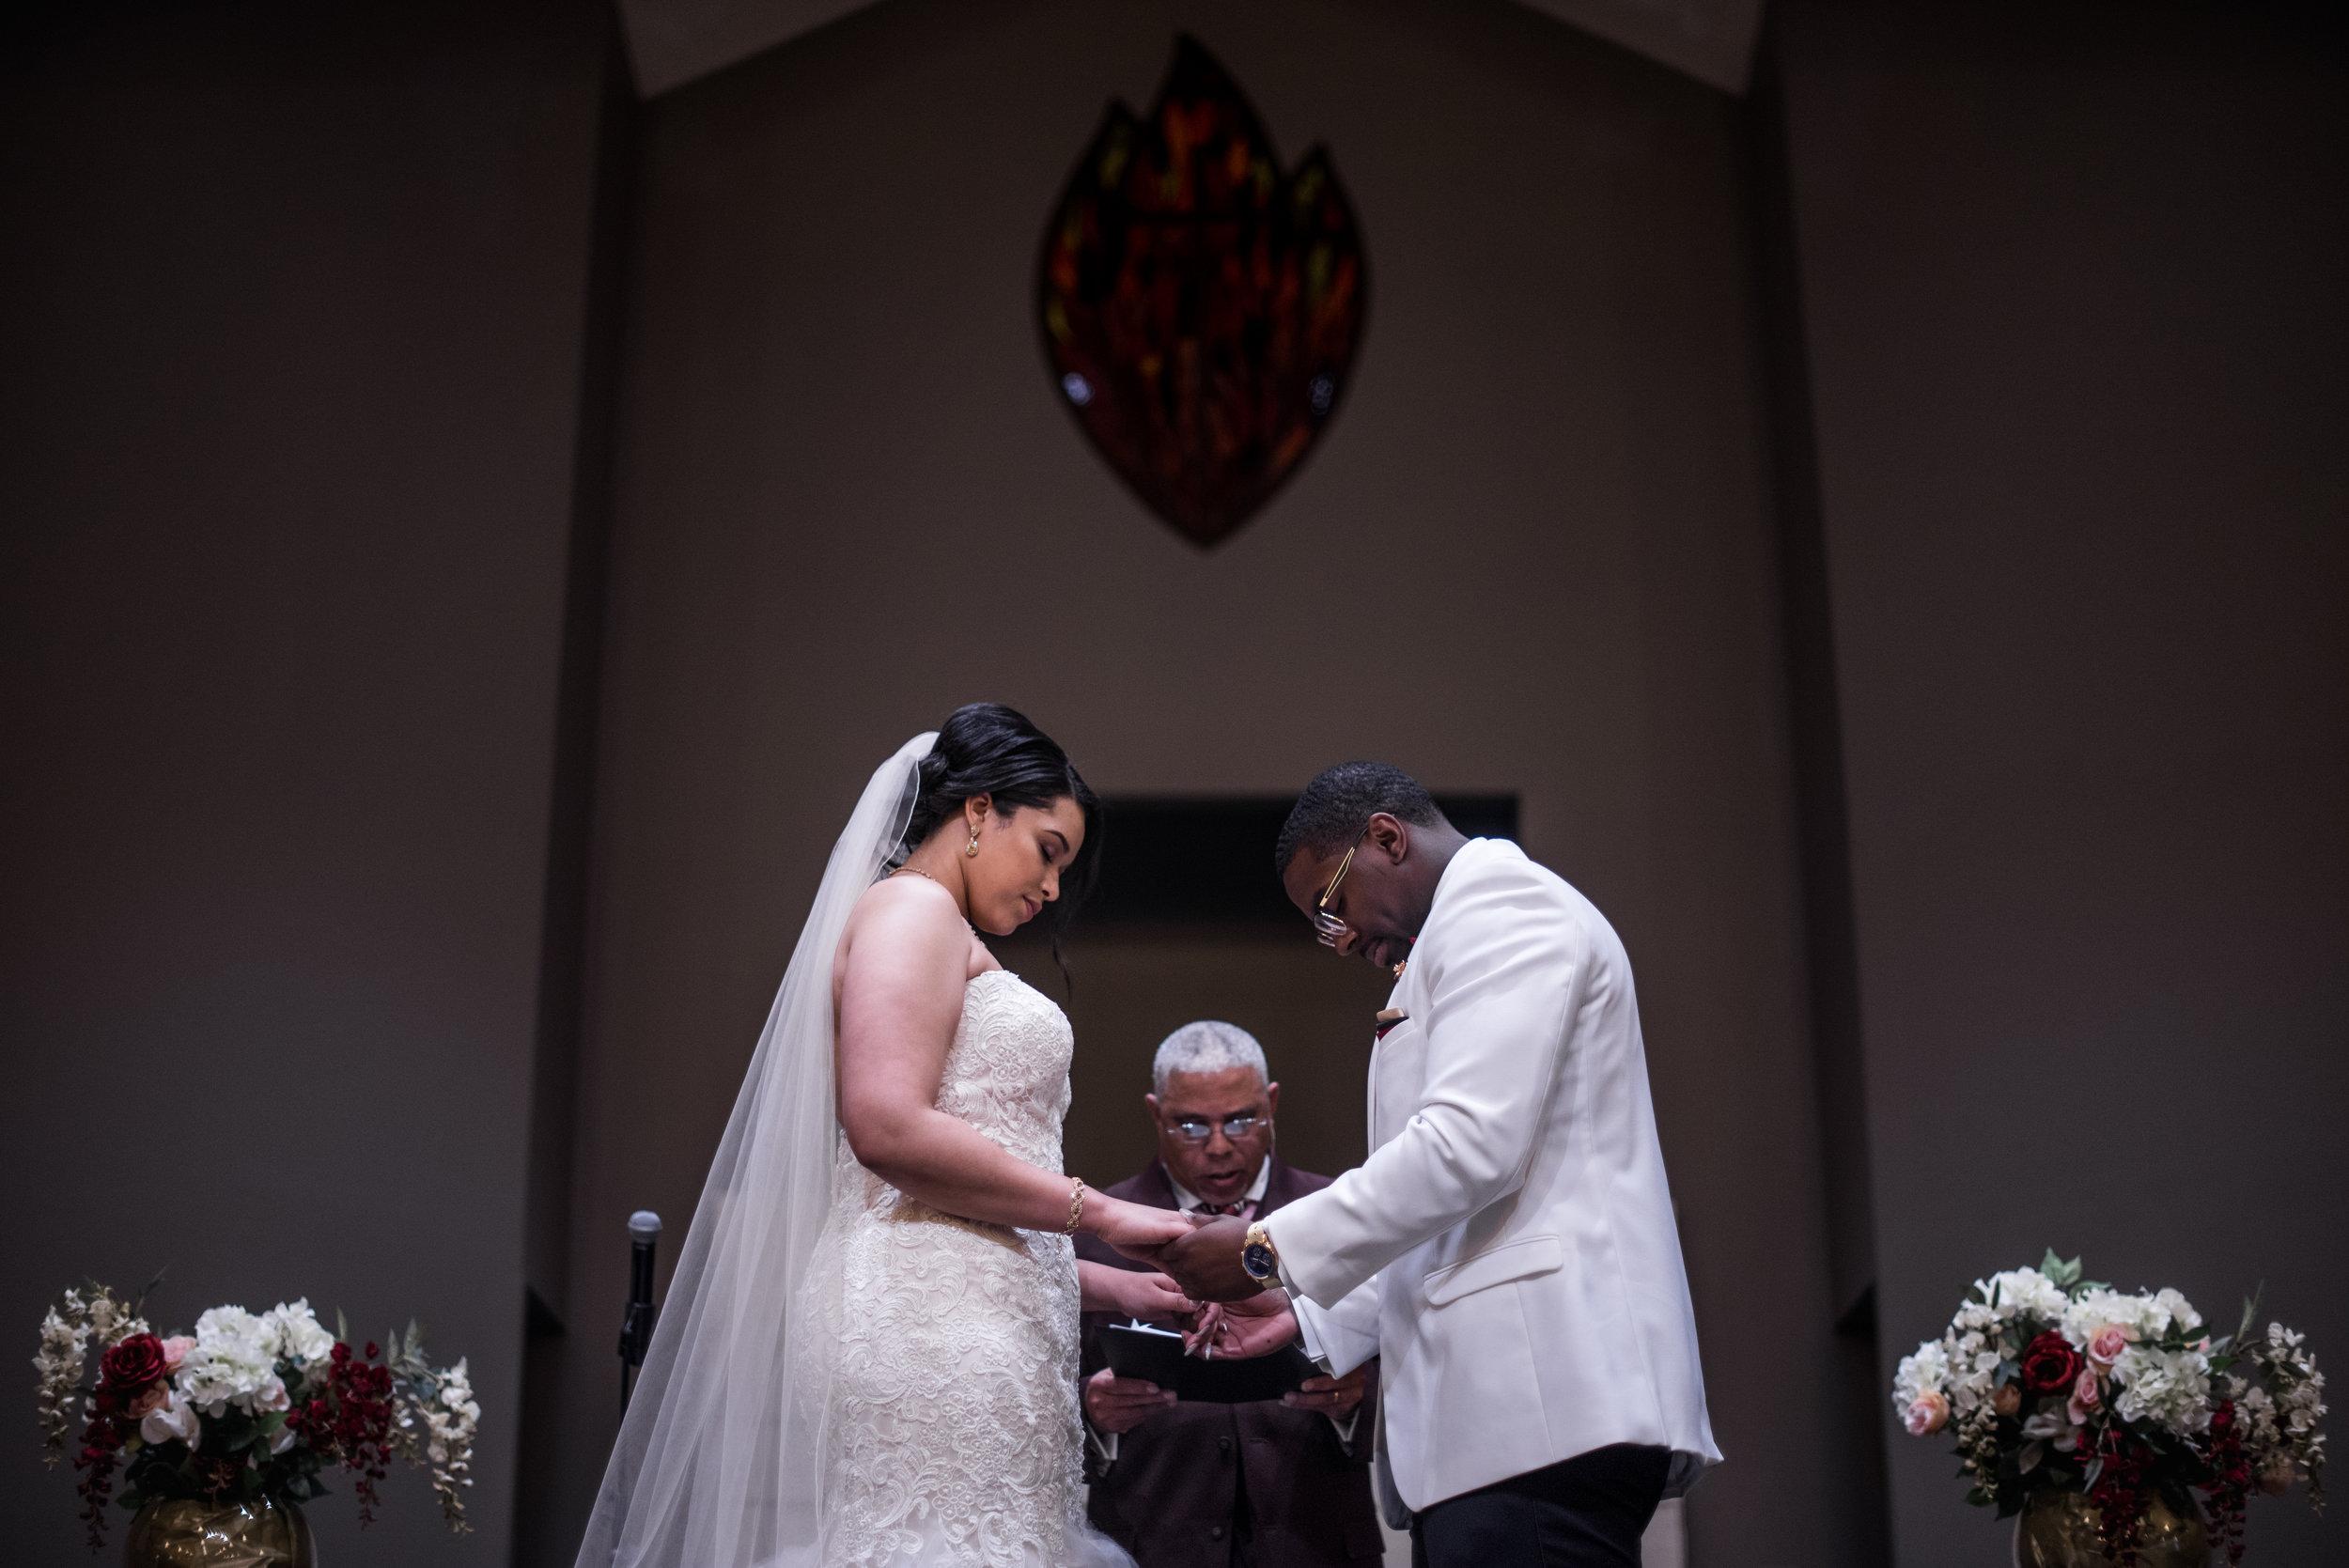 Burlington Iowa Wedding Midwest Photographer Melissa Cervantes _ Chantelle and Isaiah 321b.jpg